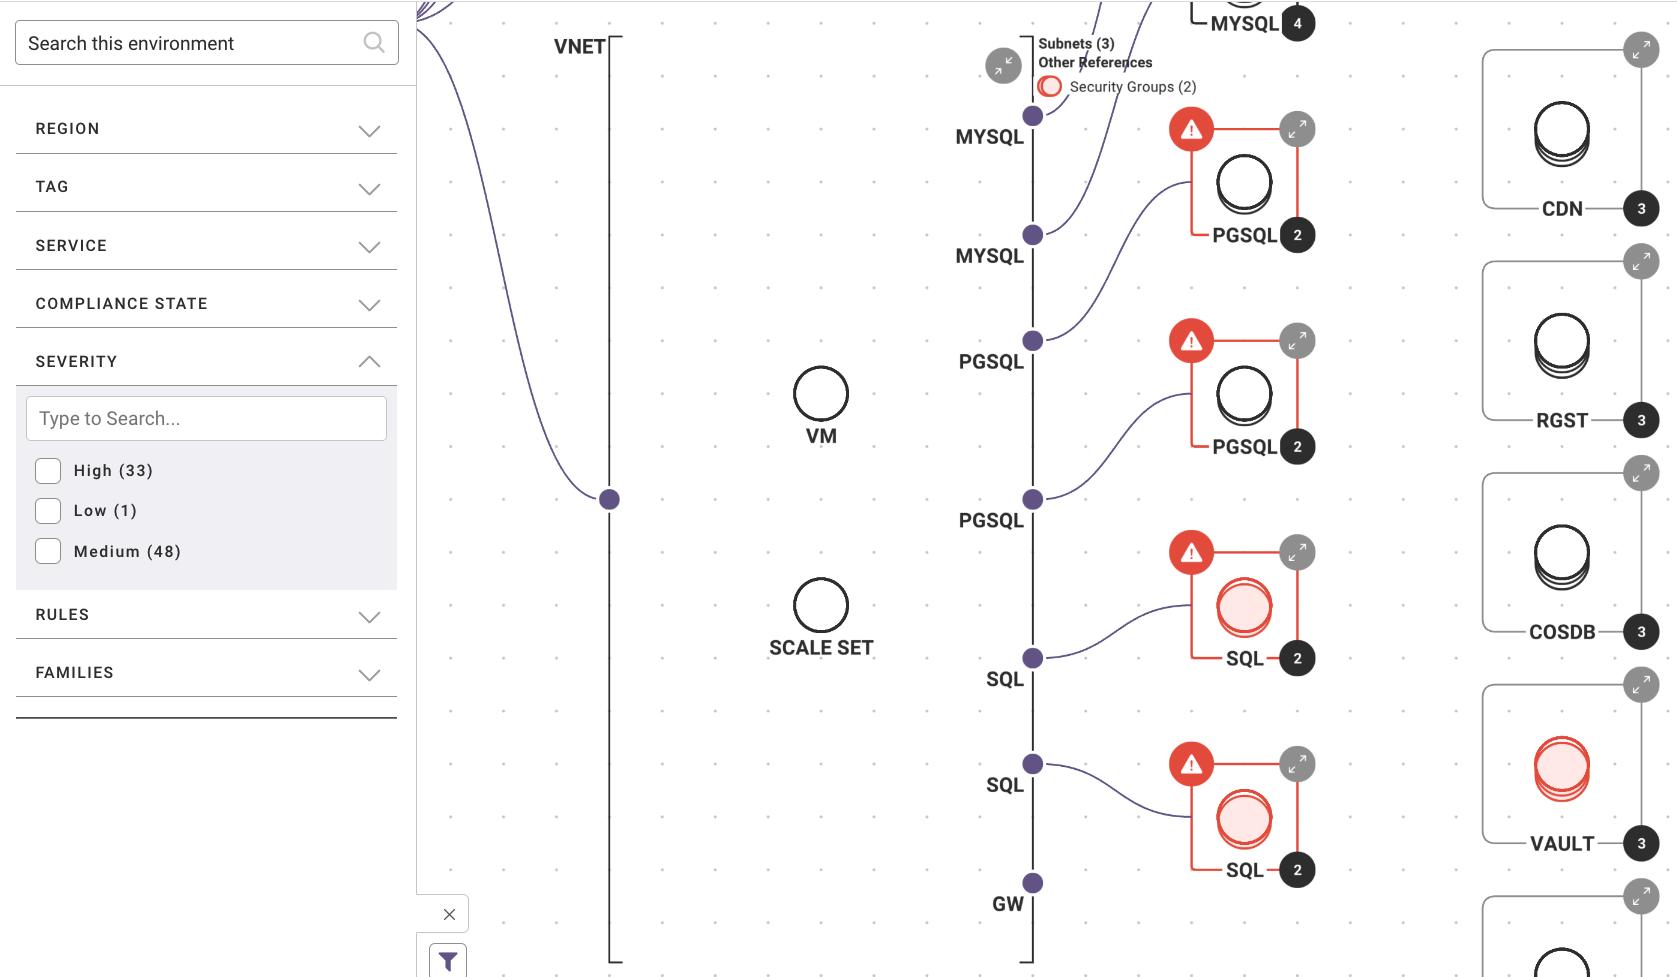 Resource Visualizer 1 - Vulnerabilities